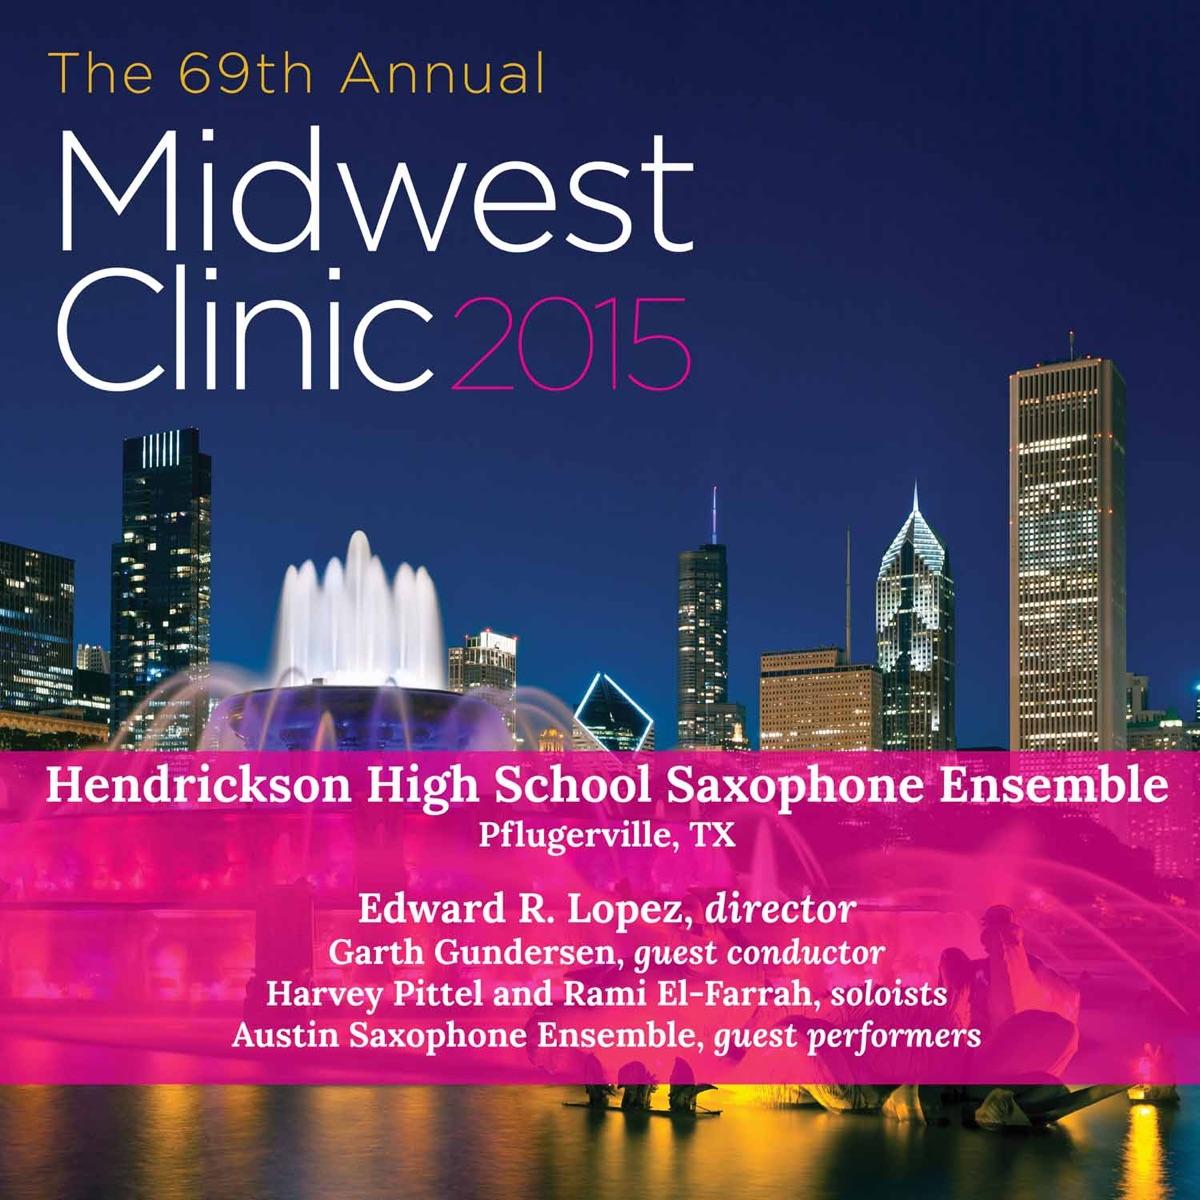 2015 Midwest Clinic Hendrickson High School Saxophone Ensemble Live Hendrickson High School Saxophone Ensemble  Edward R Lopez CD cover